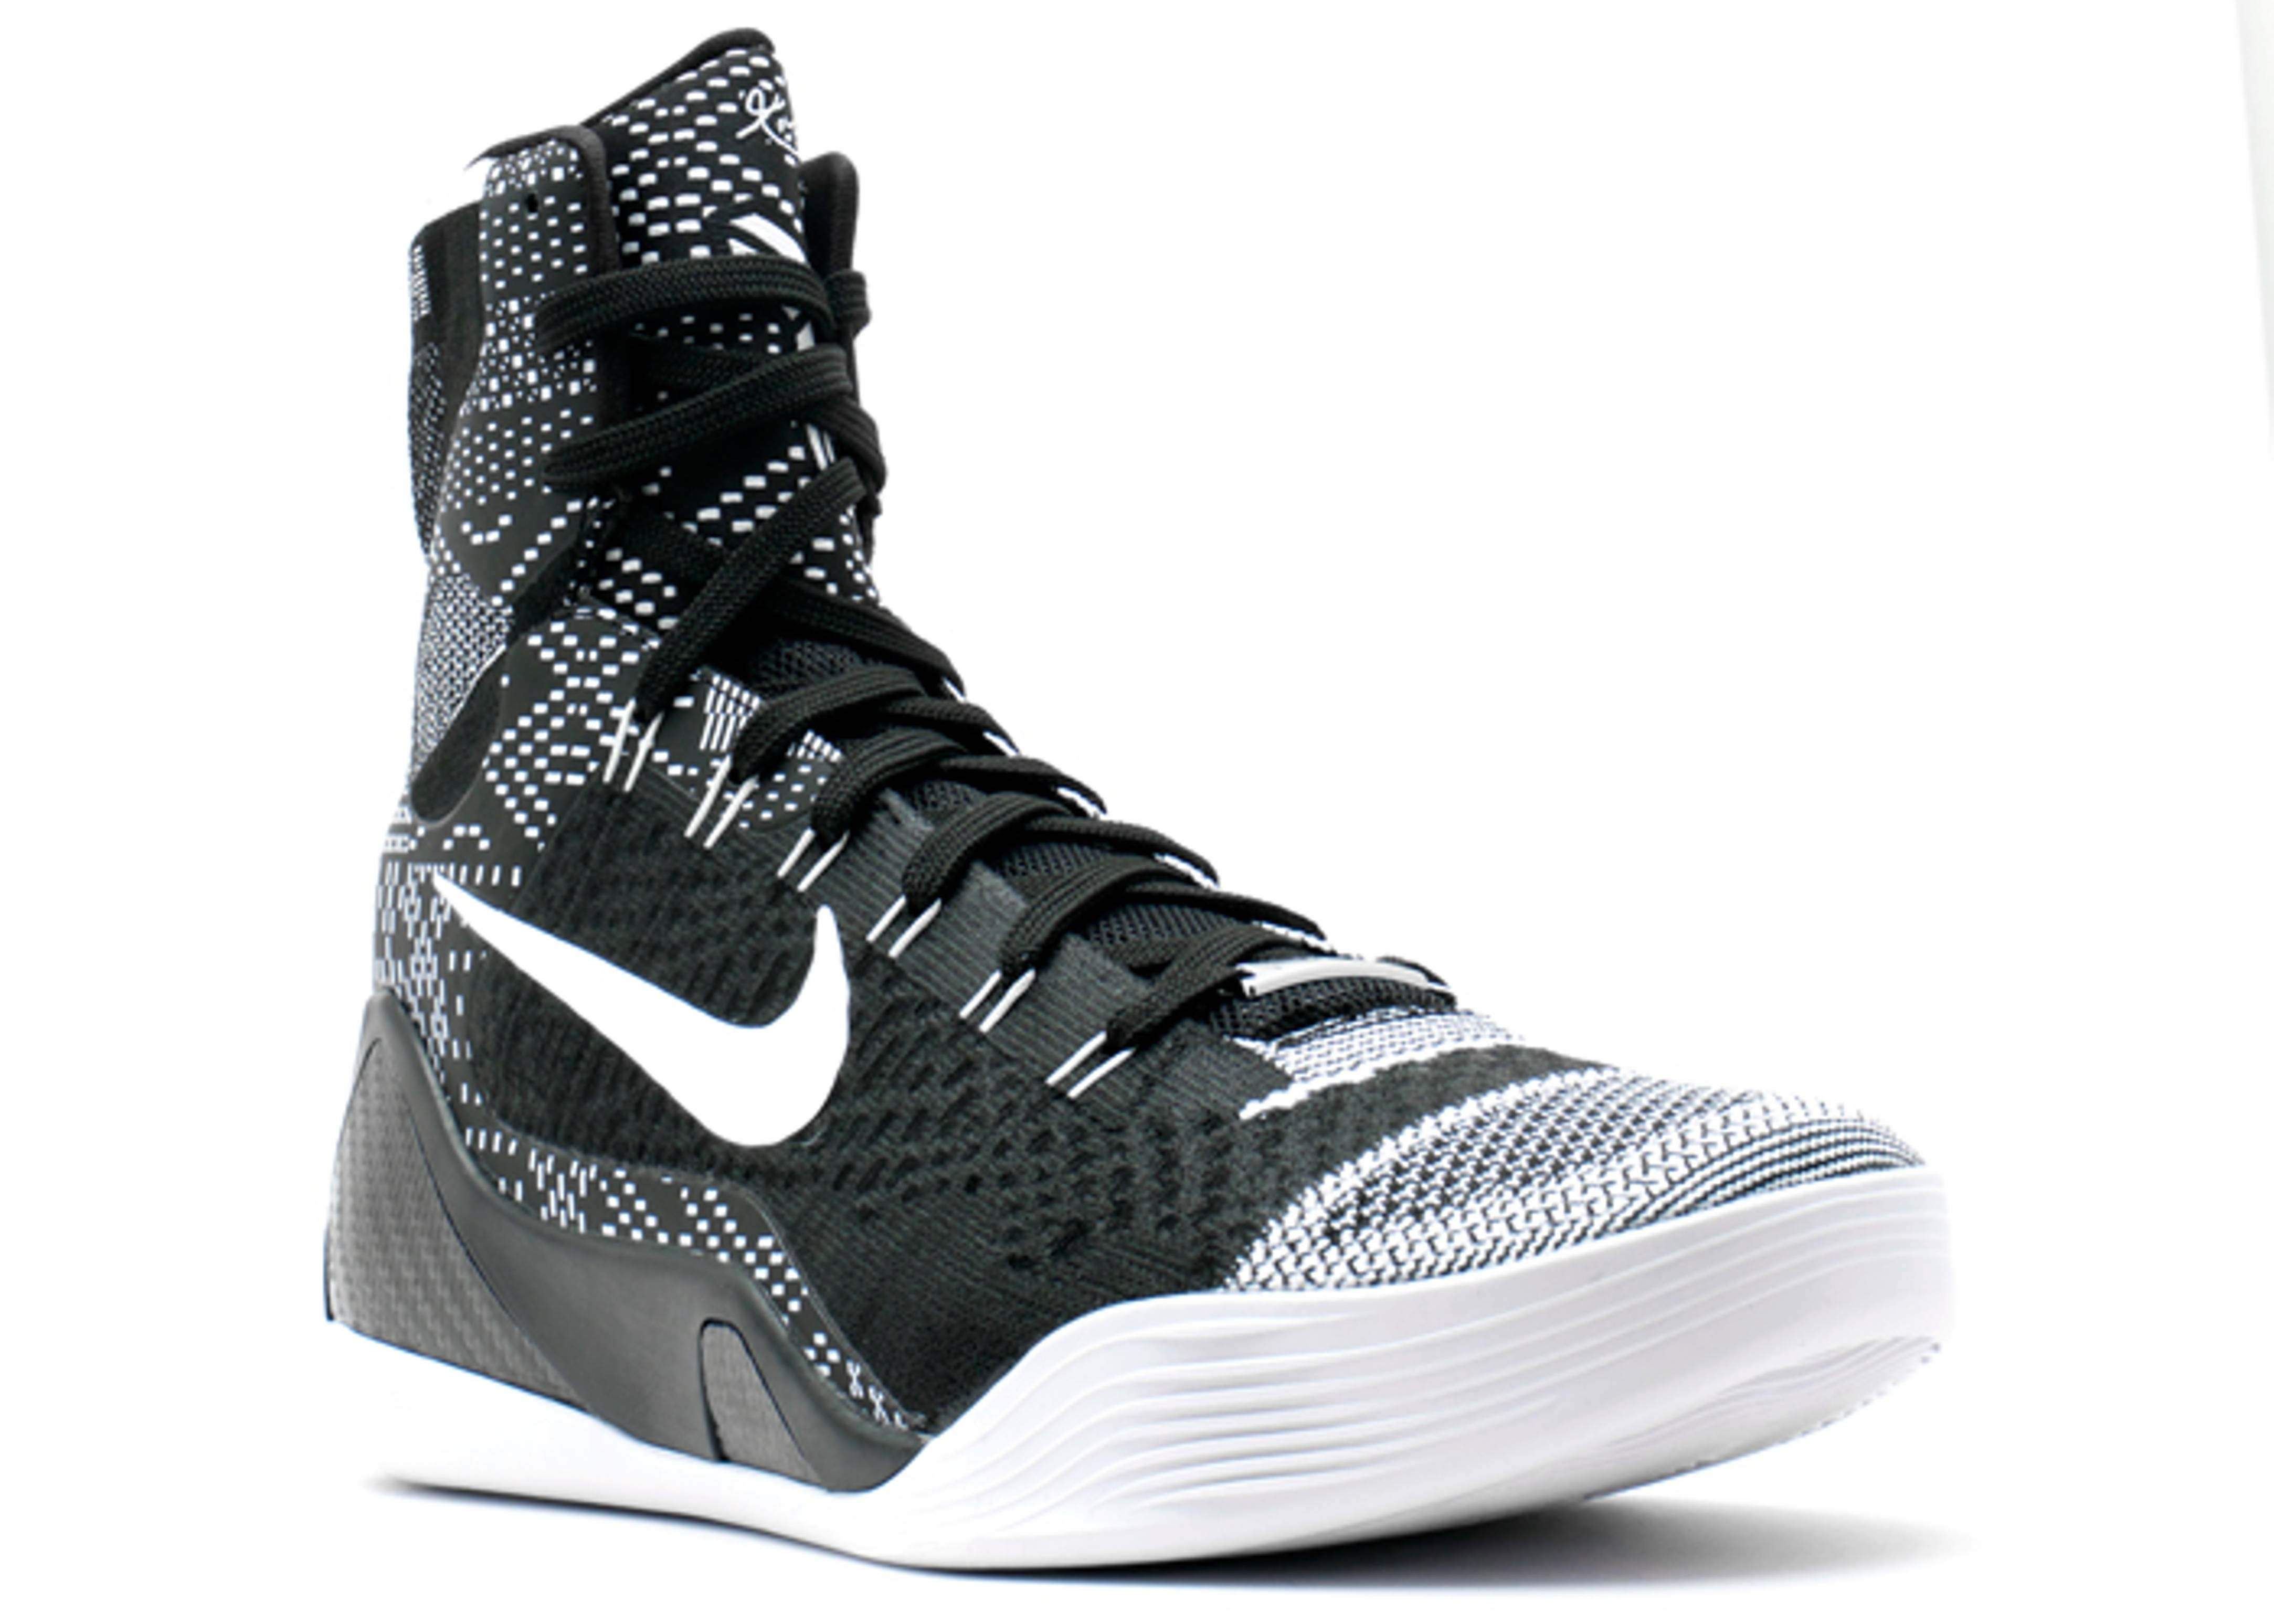 Nike Zoom Kobe | Online Shop Basketzone.net